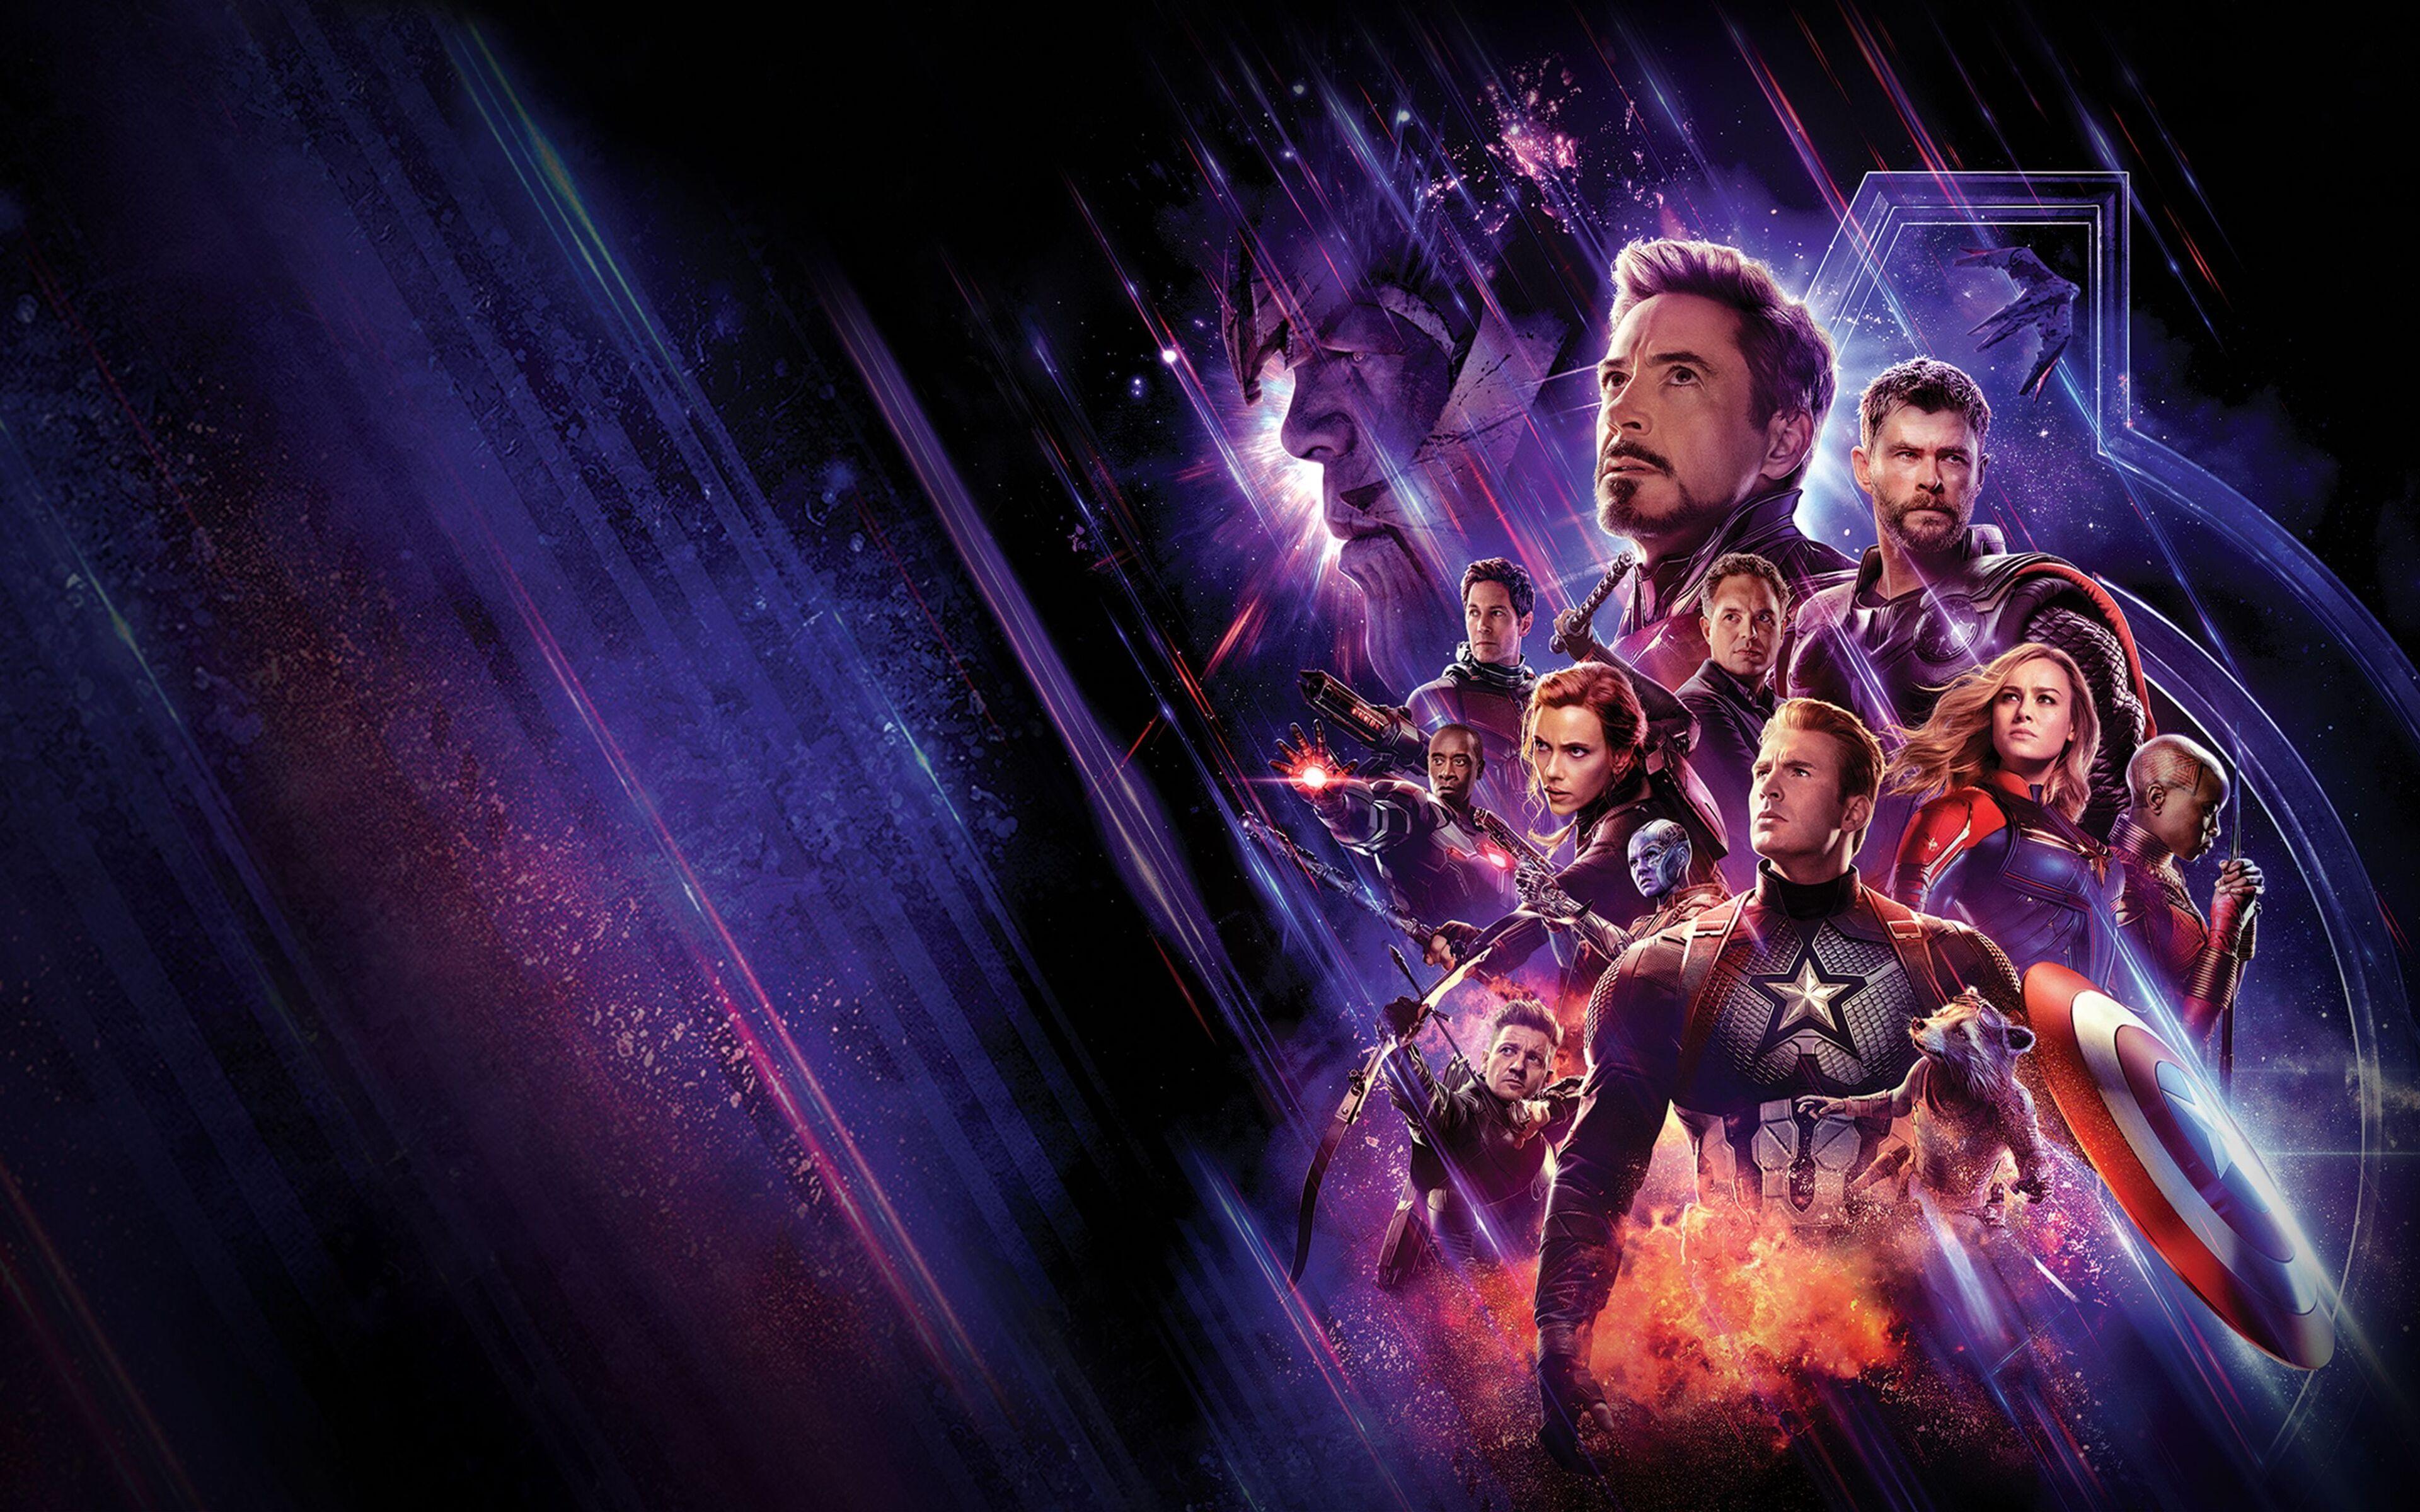 3840x2400 Disney Plus Avengers Endgame 4k 4k HD 4k ...